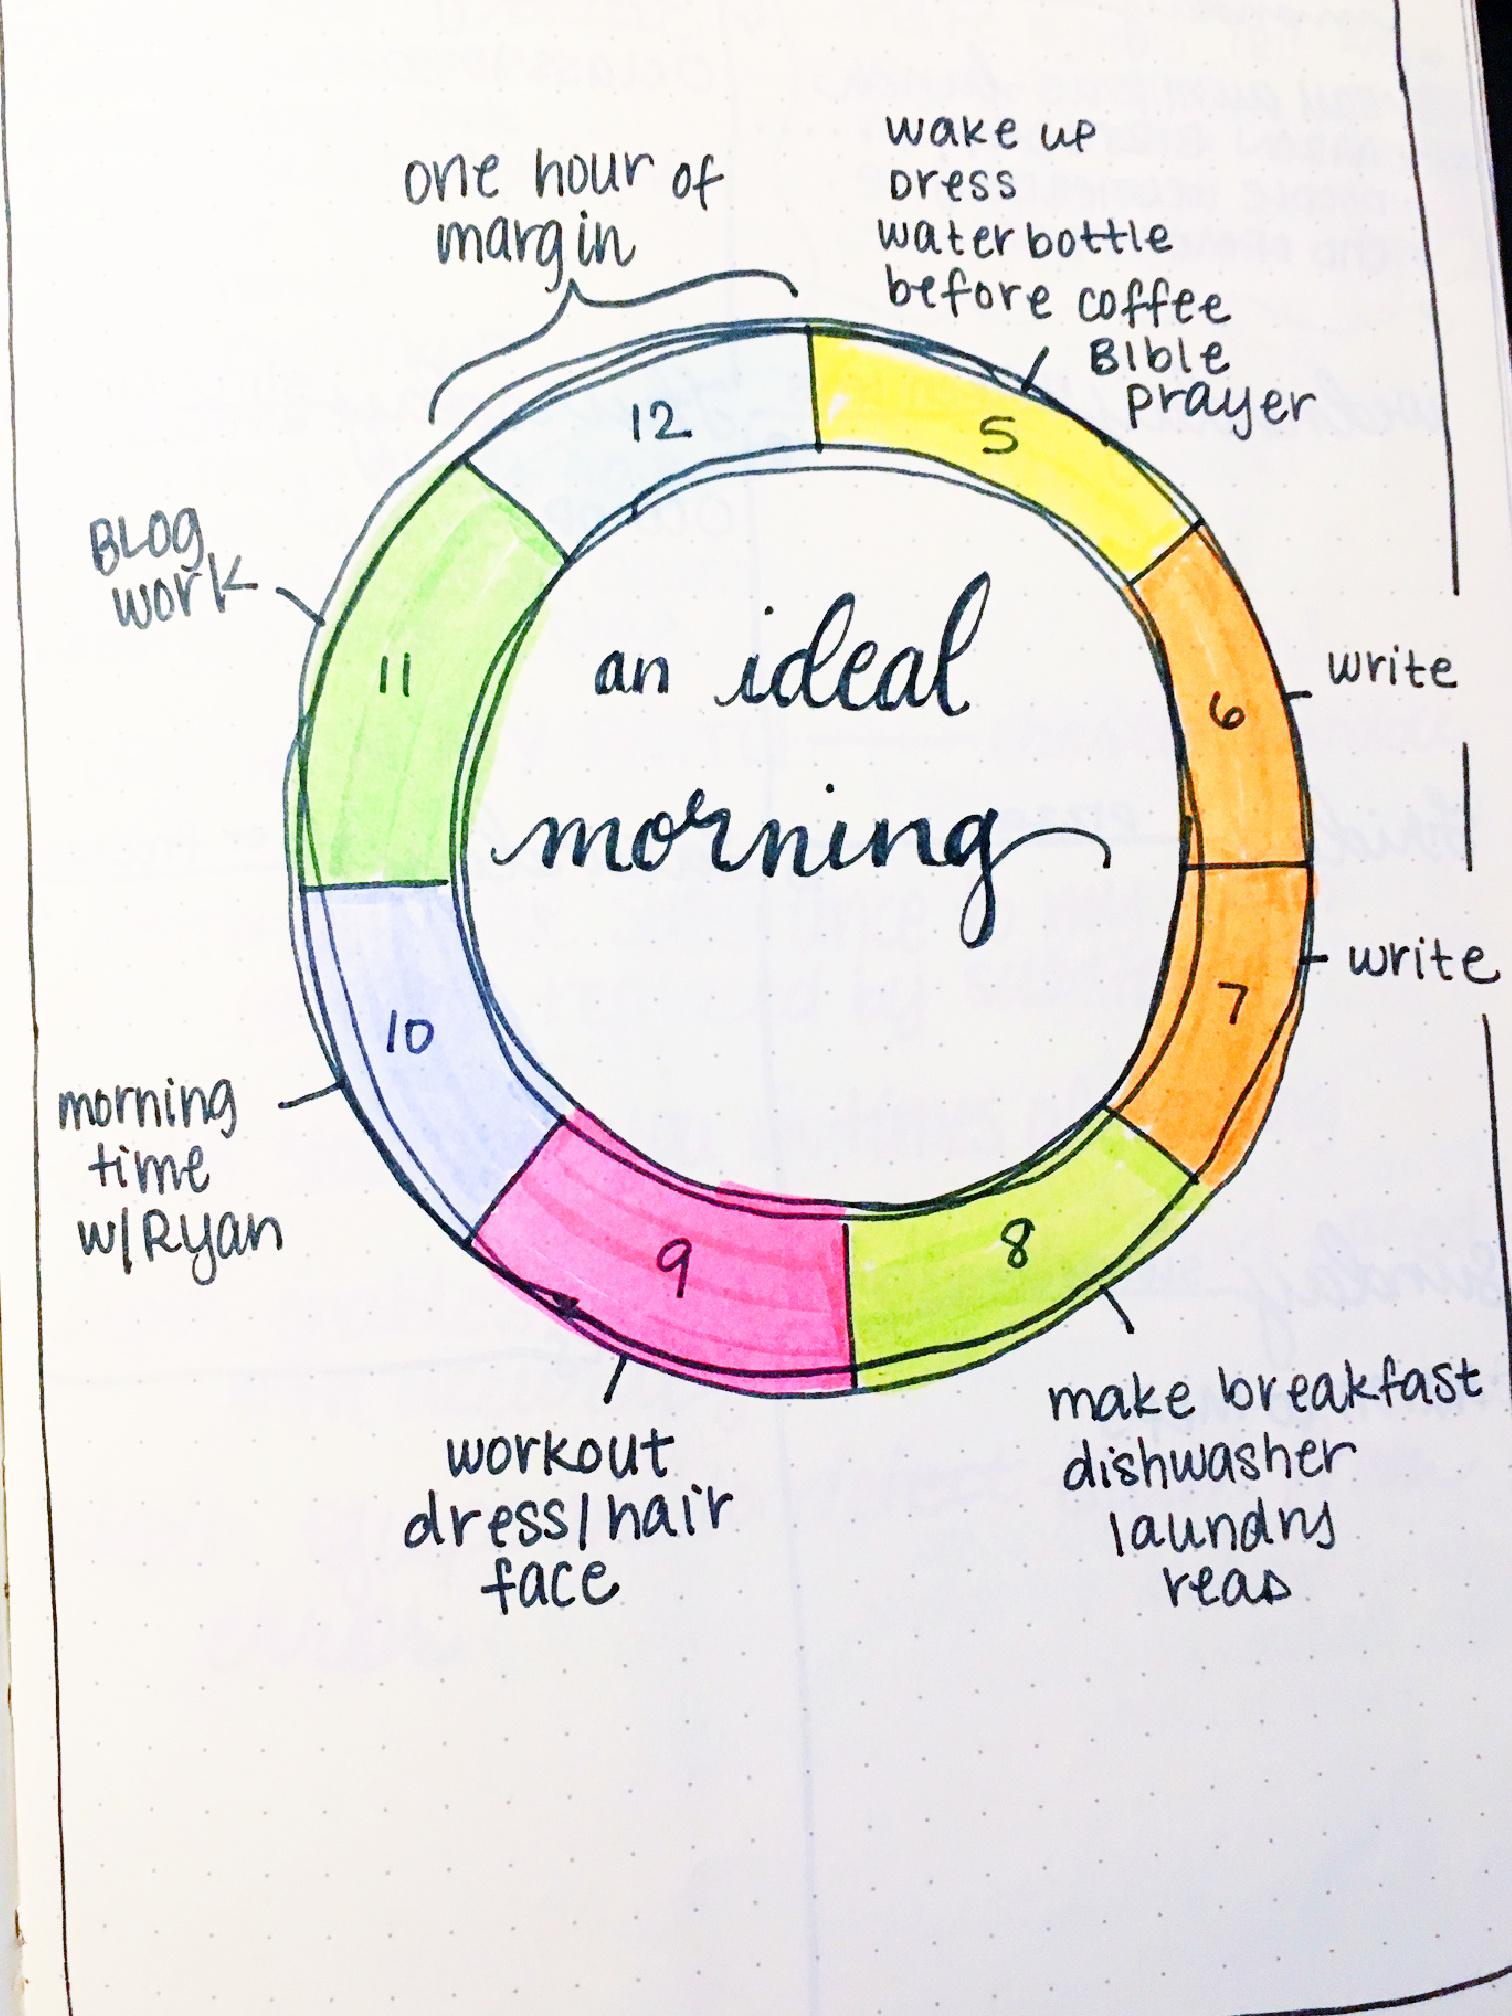 Bullet journal – week 2 + morning routines